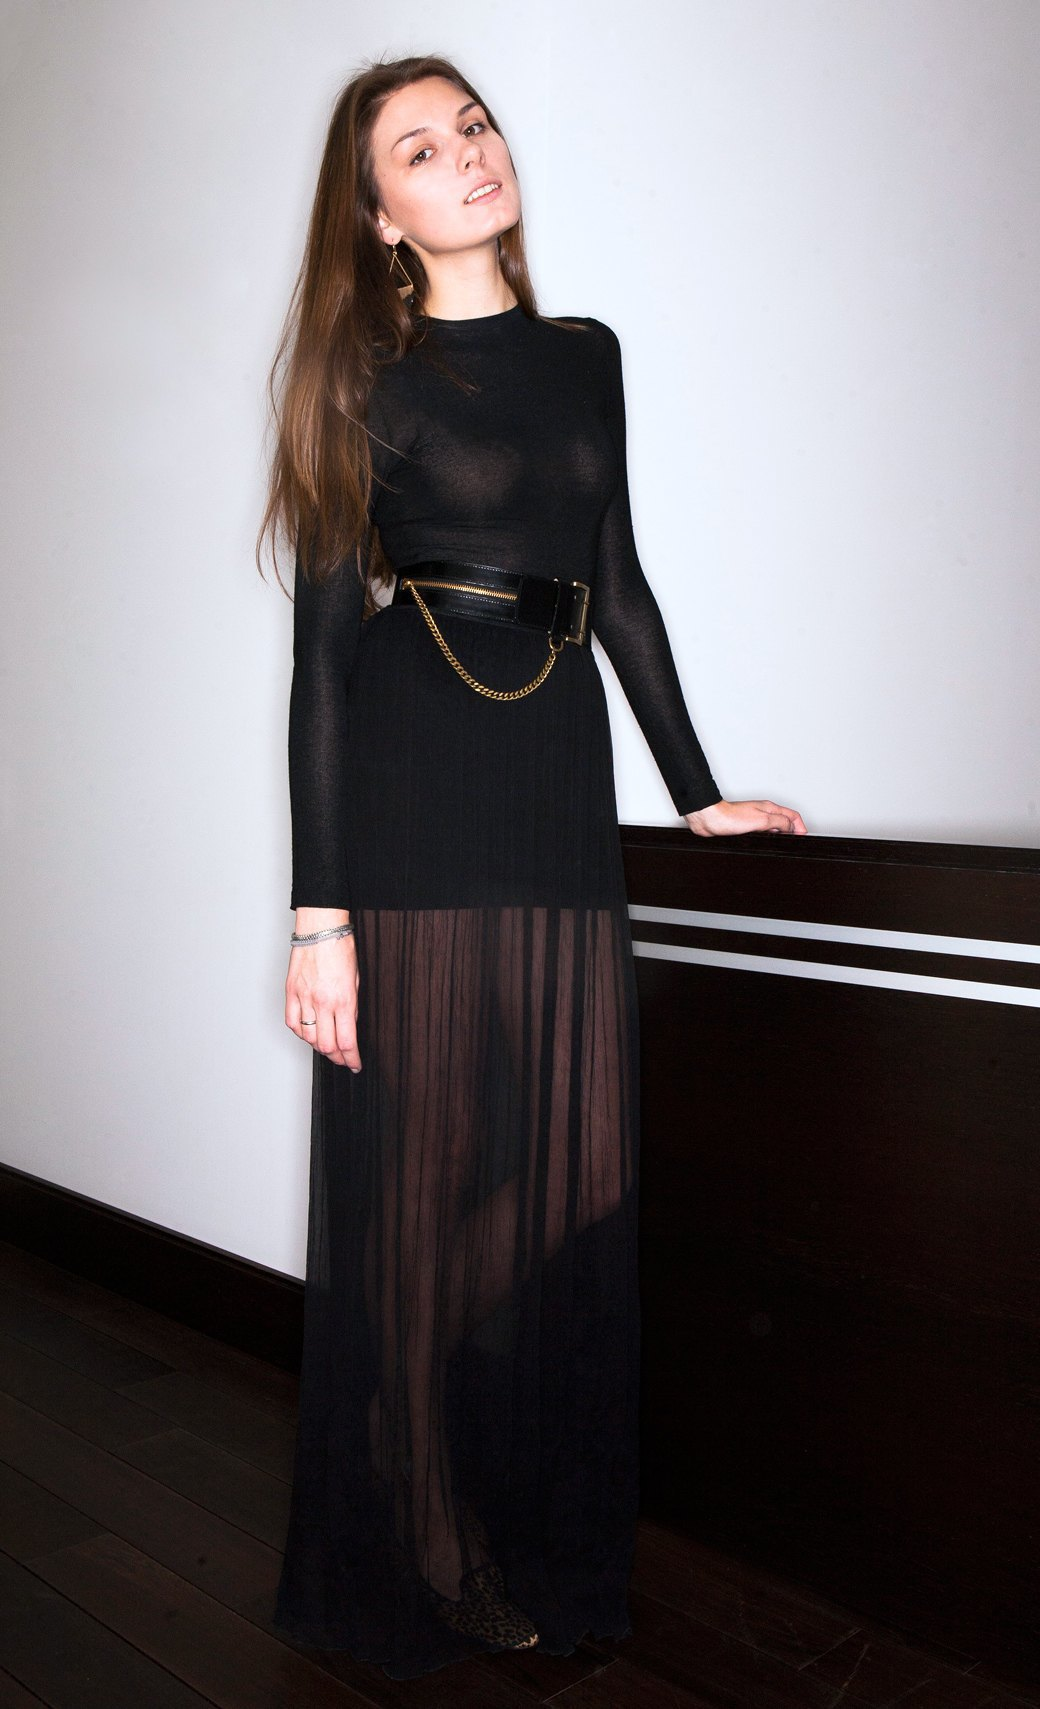 Дарья Самкович,  дизайнер марки I AM. Изображение № 2.